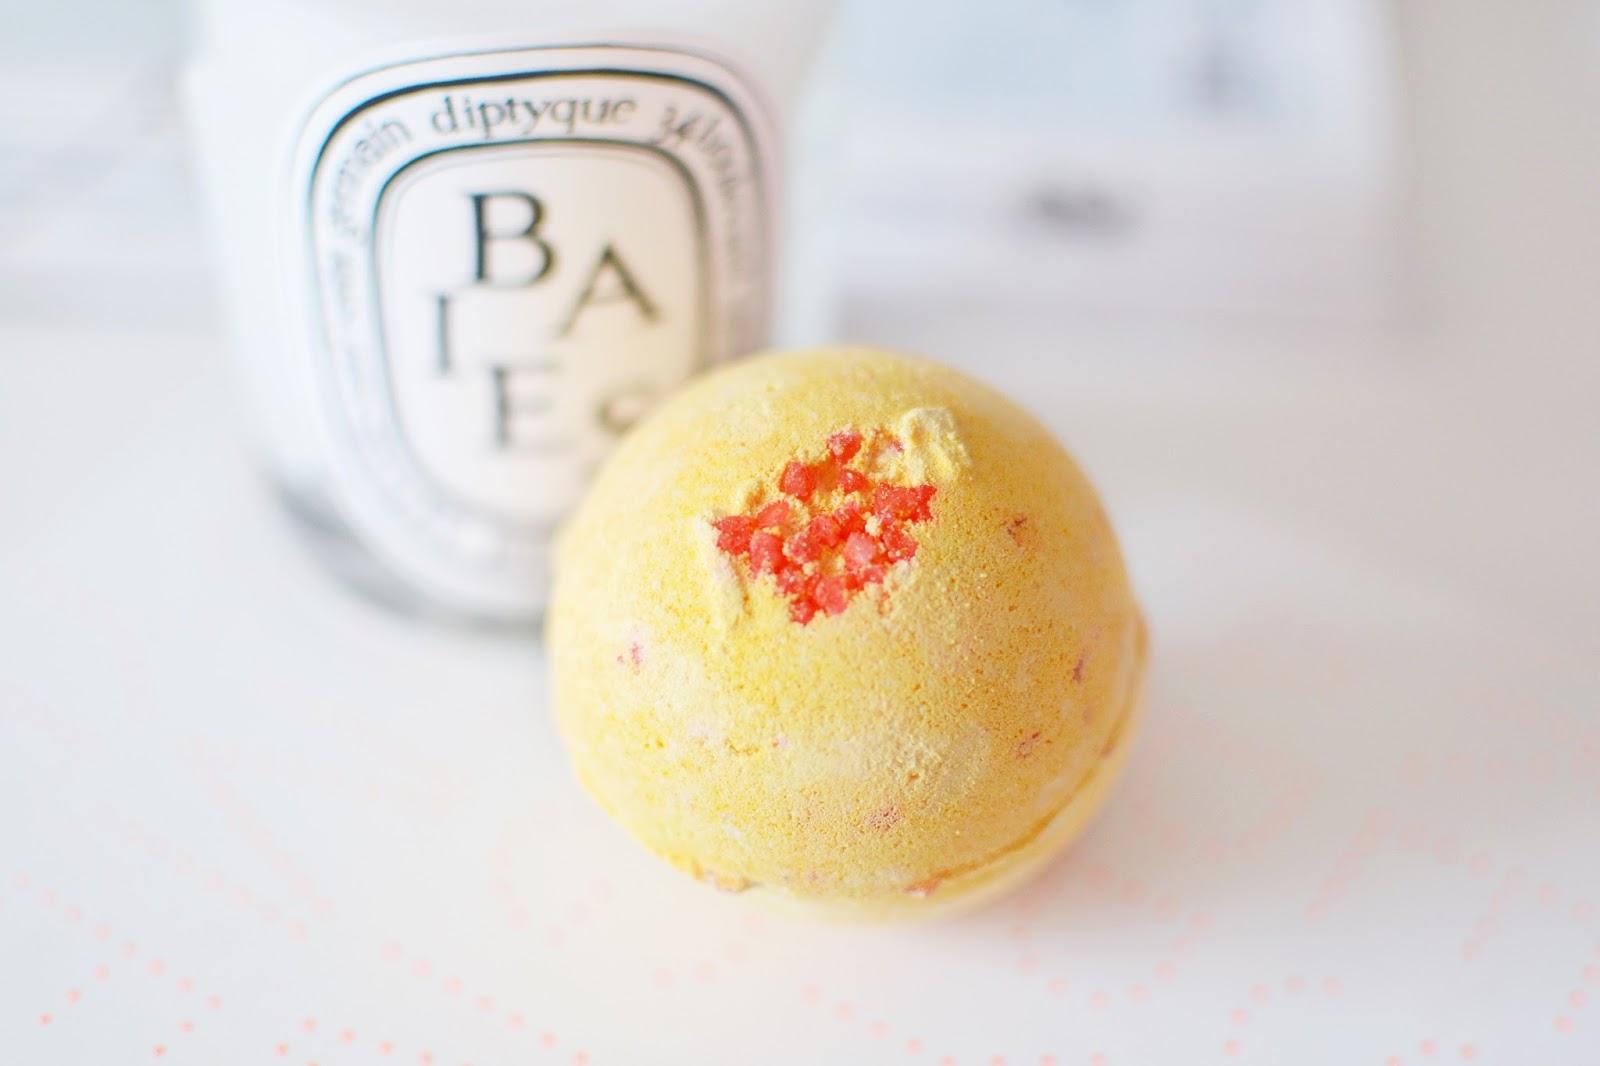 cinders bath bomb